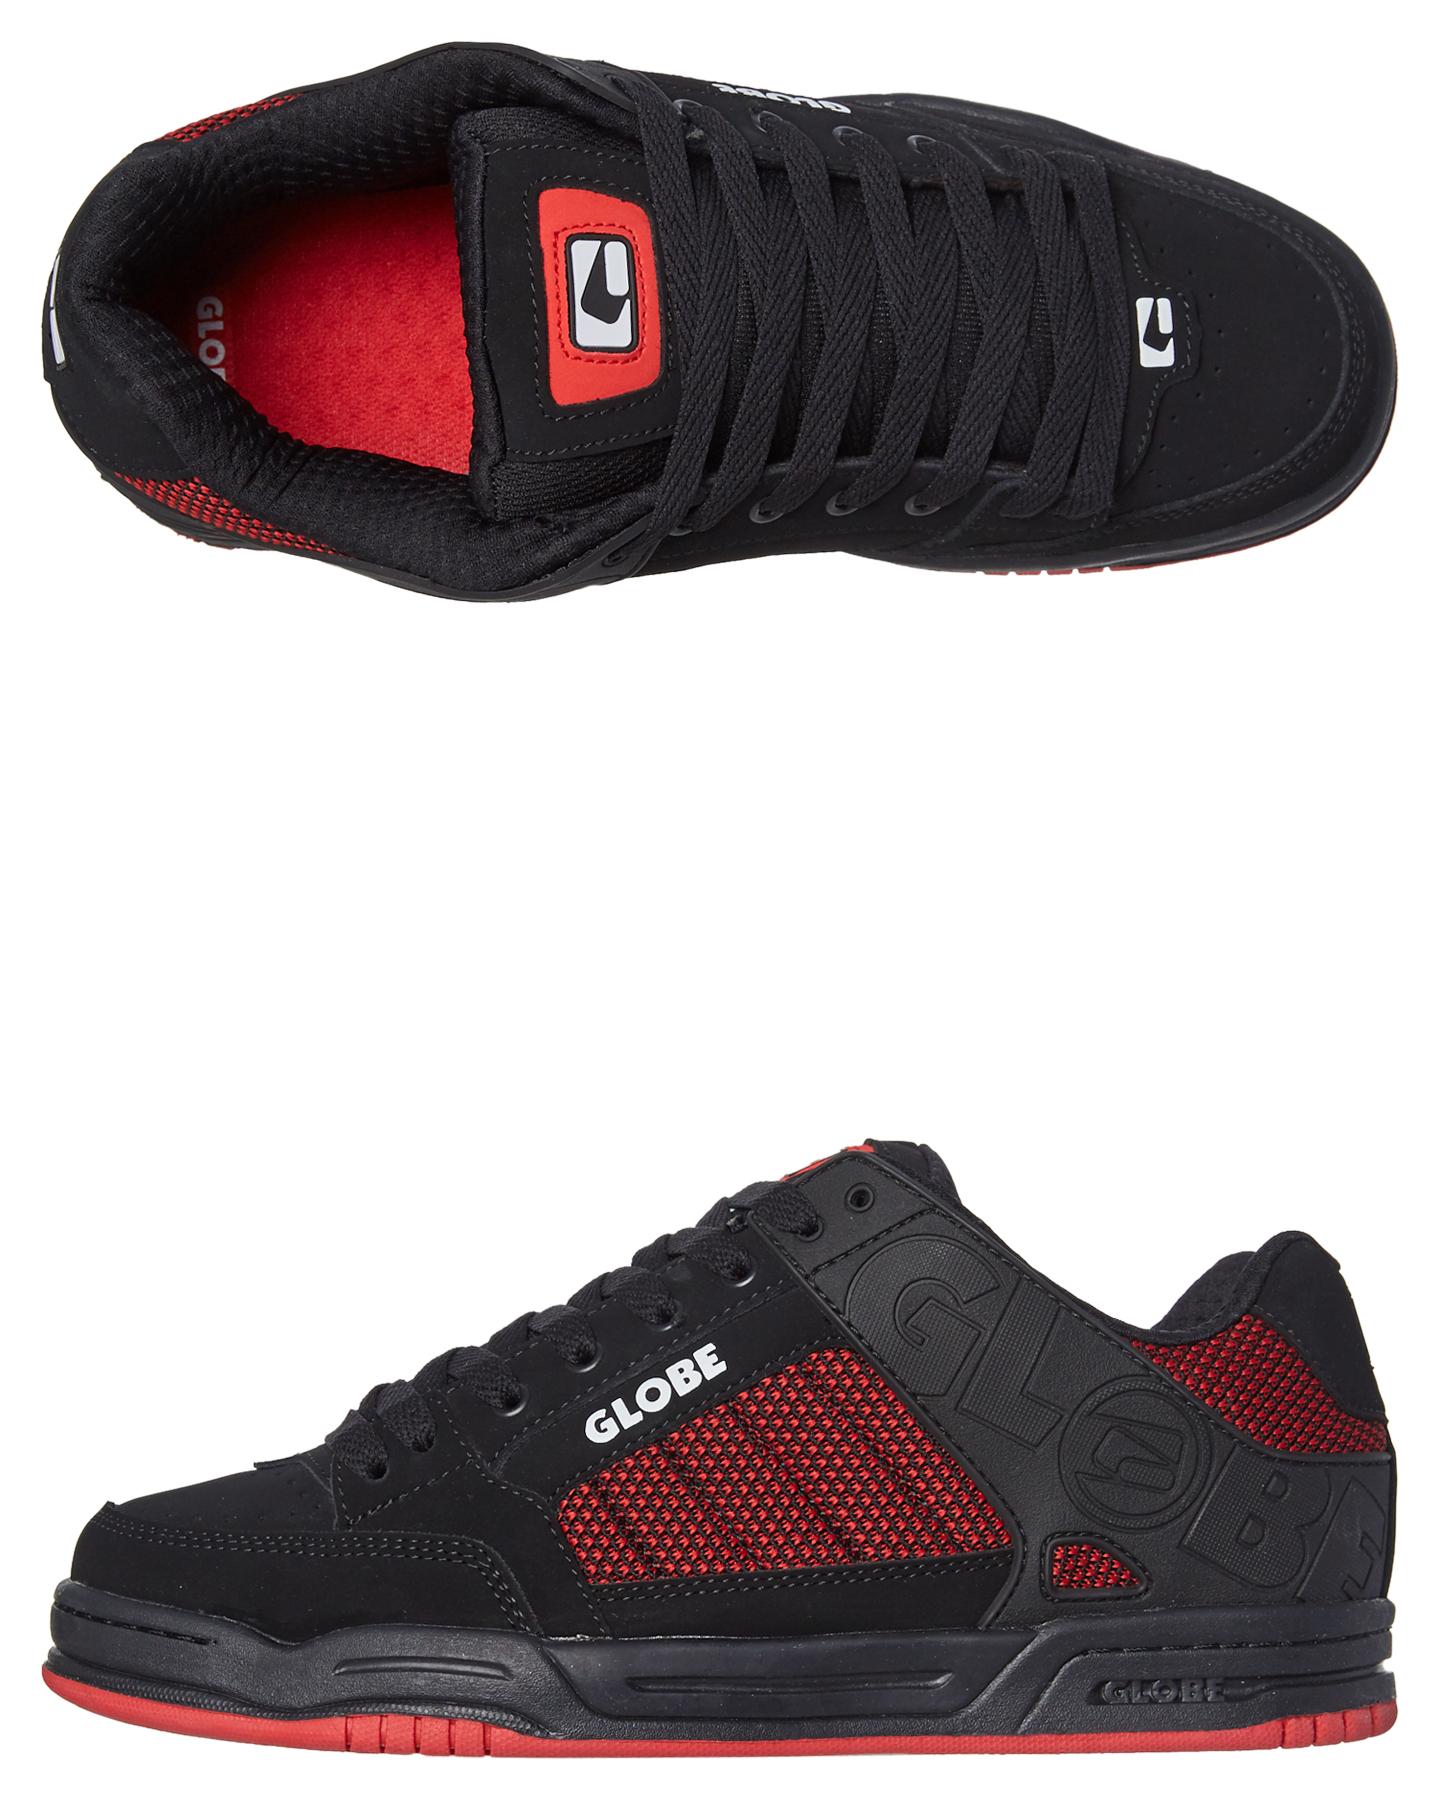 401892490b85 Details about New Globe Skate Men s Tilt Shoe Rubber Black